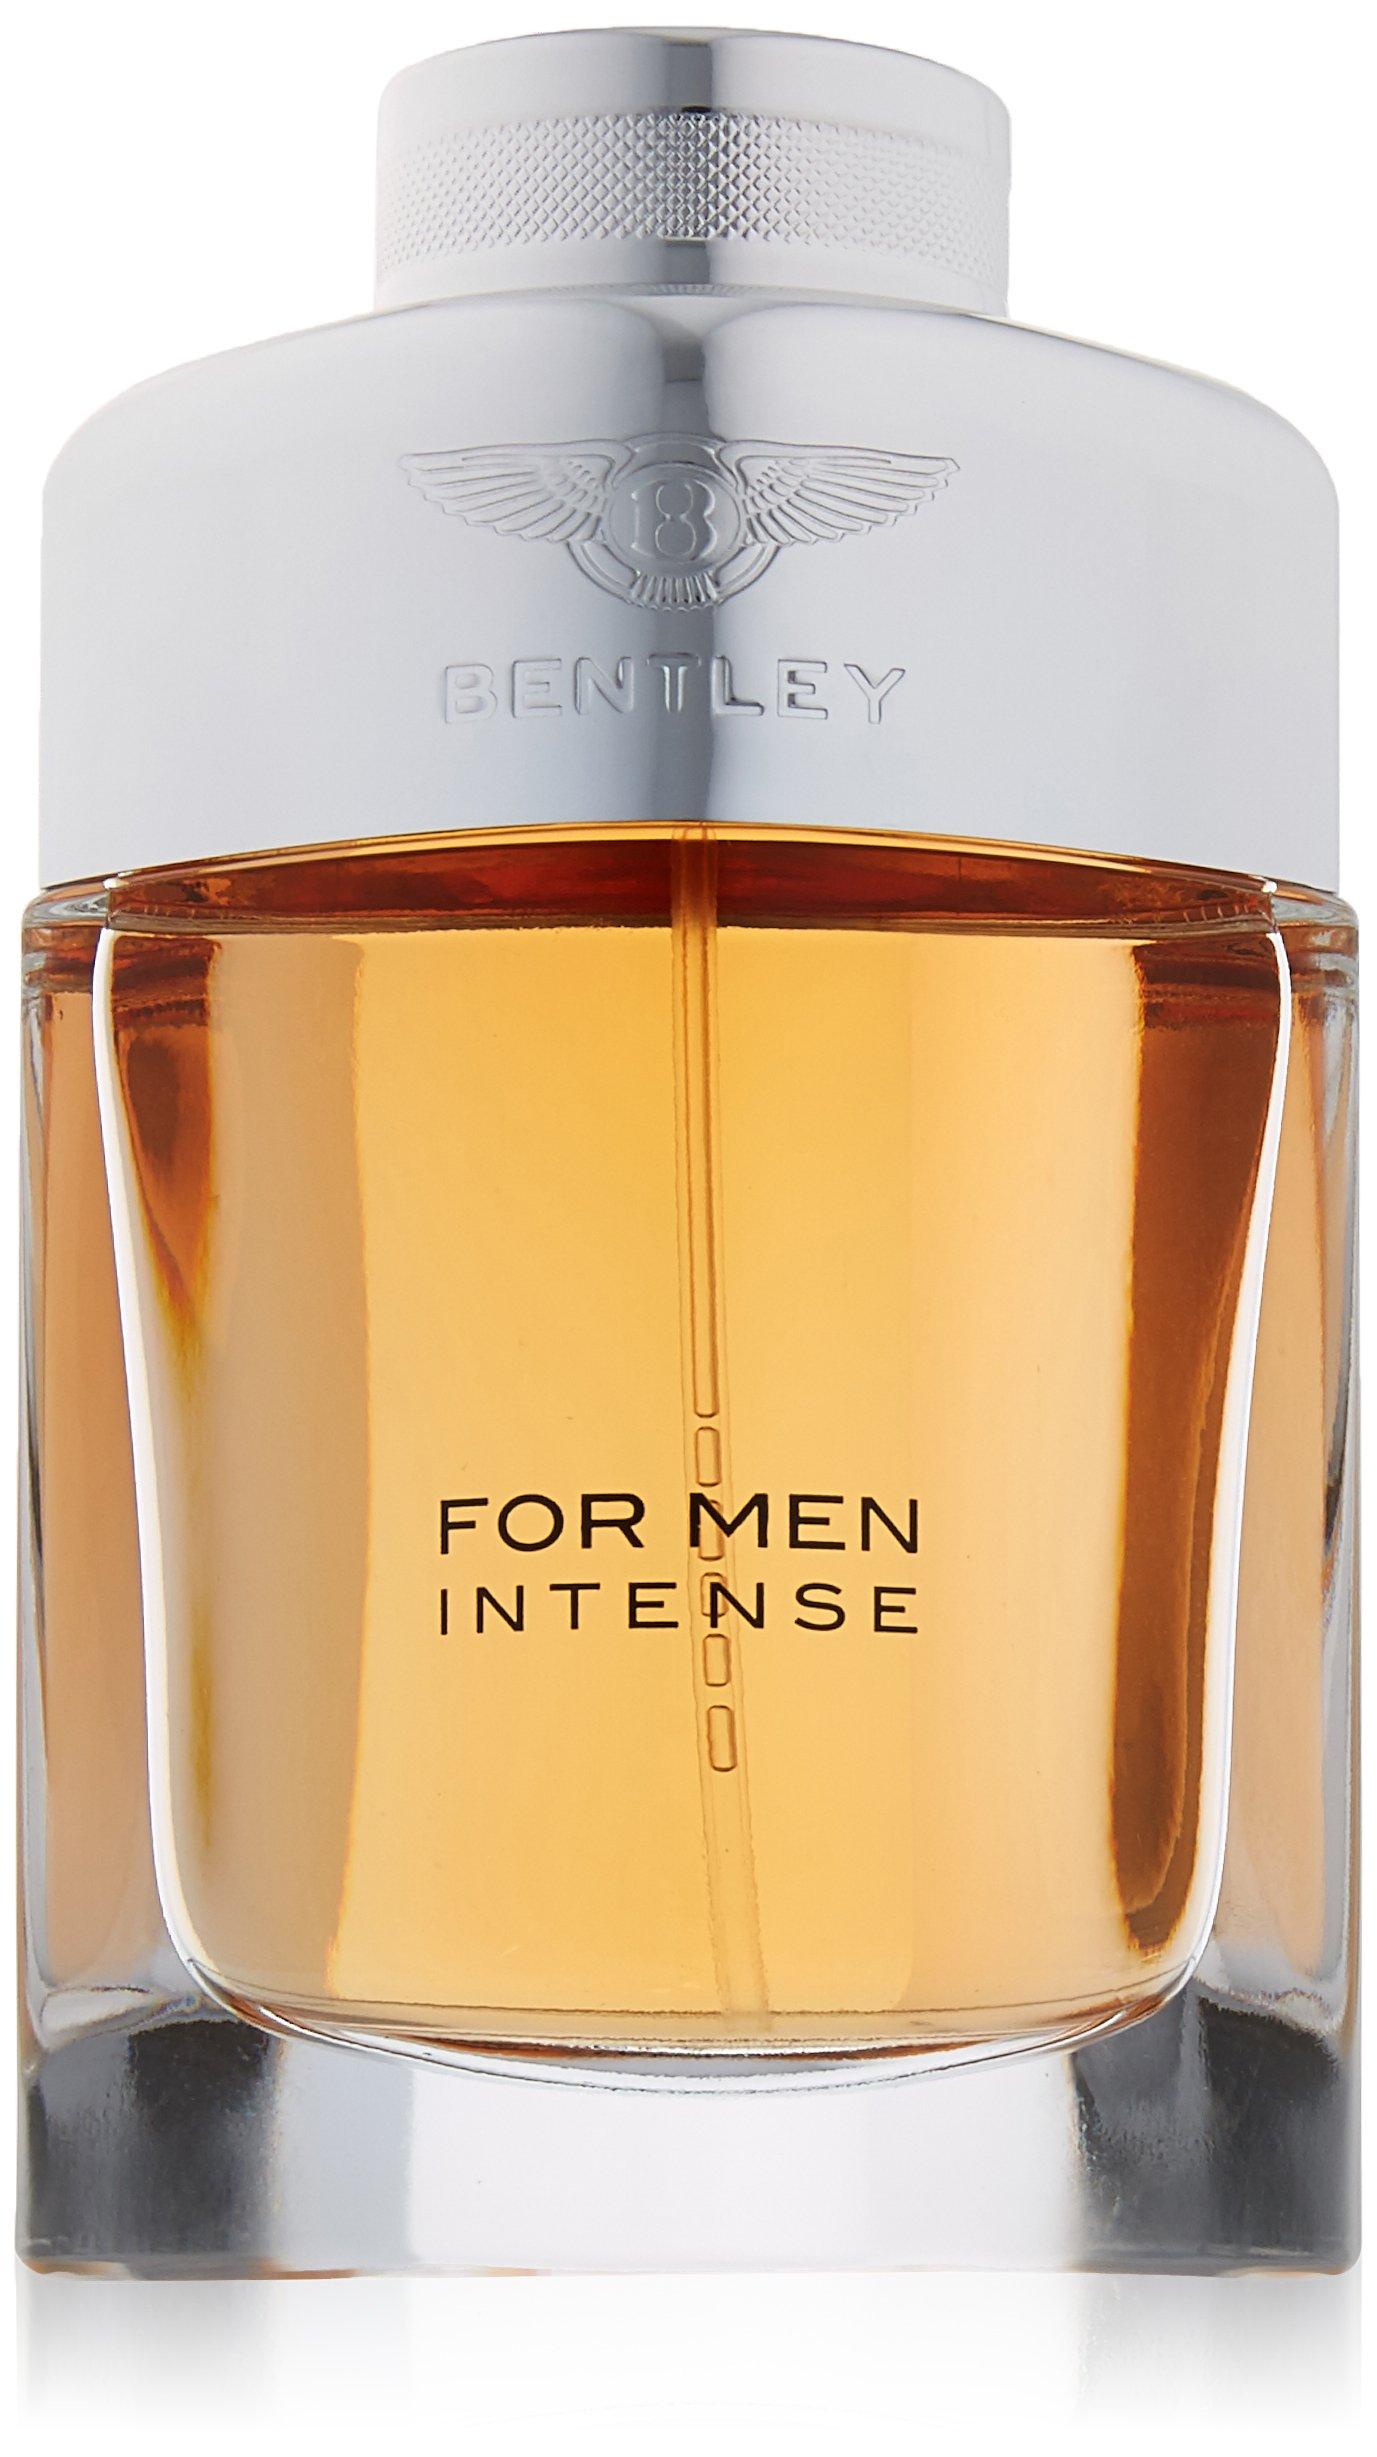 Bentley INTENSE Eau De Parfum Natural Spray 3.4oz / 100ml For Men by Bentley Fragrances [Beauty] by Bentley